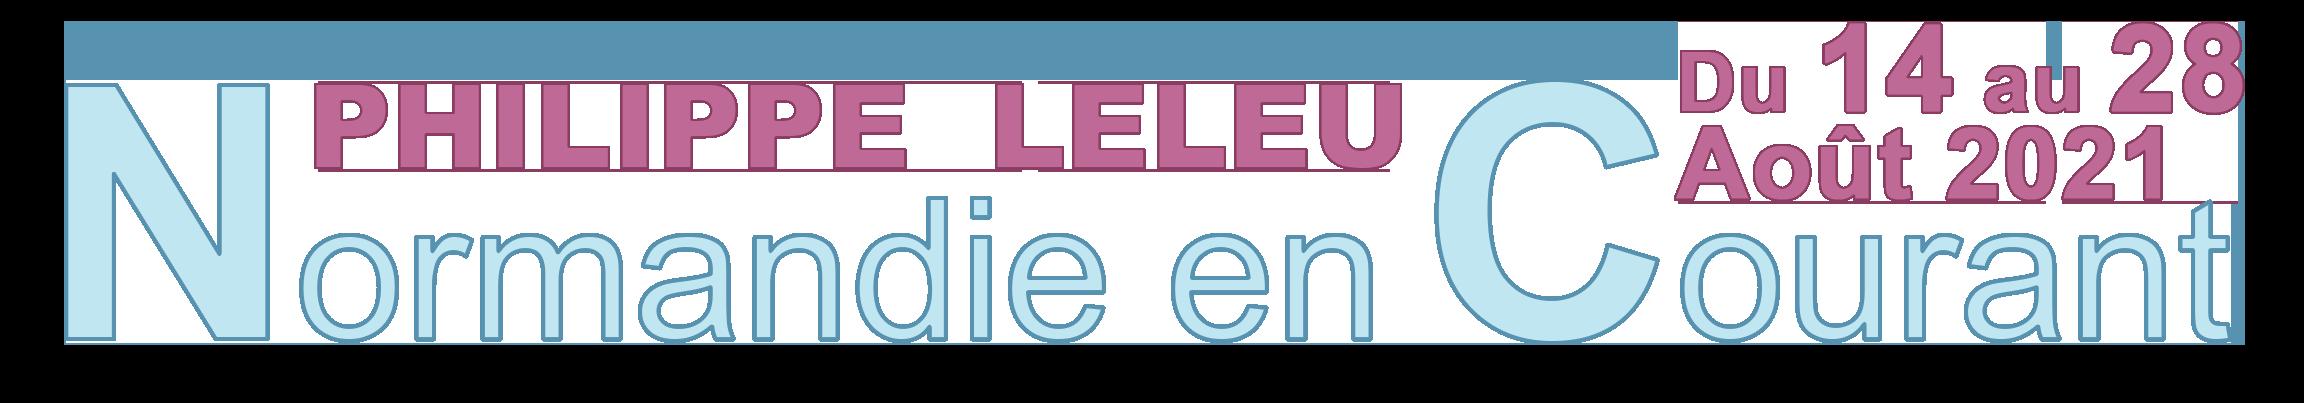 La Normandie En Courant 2021